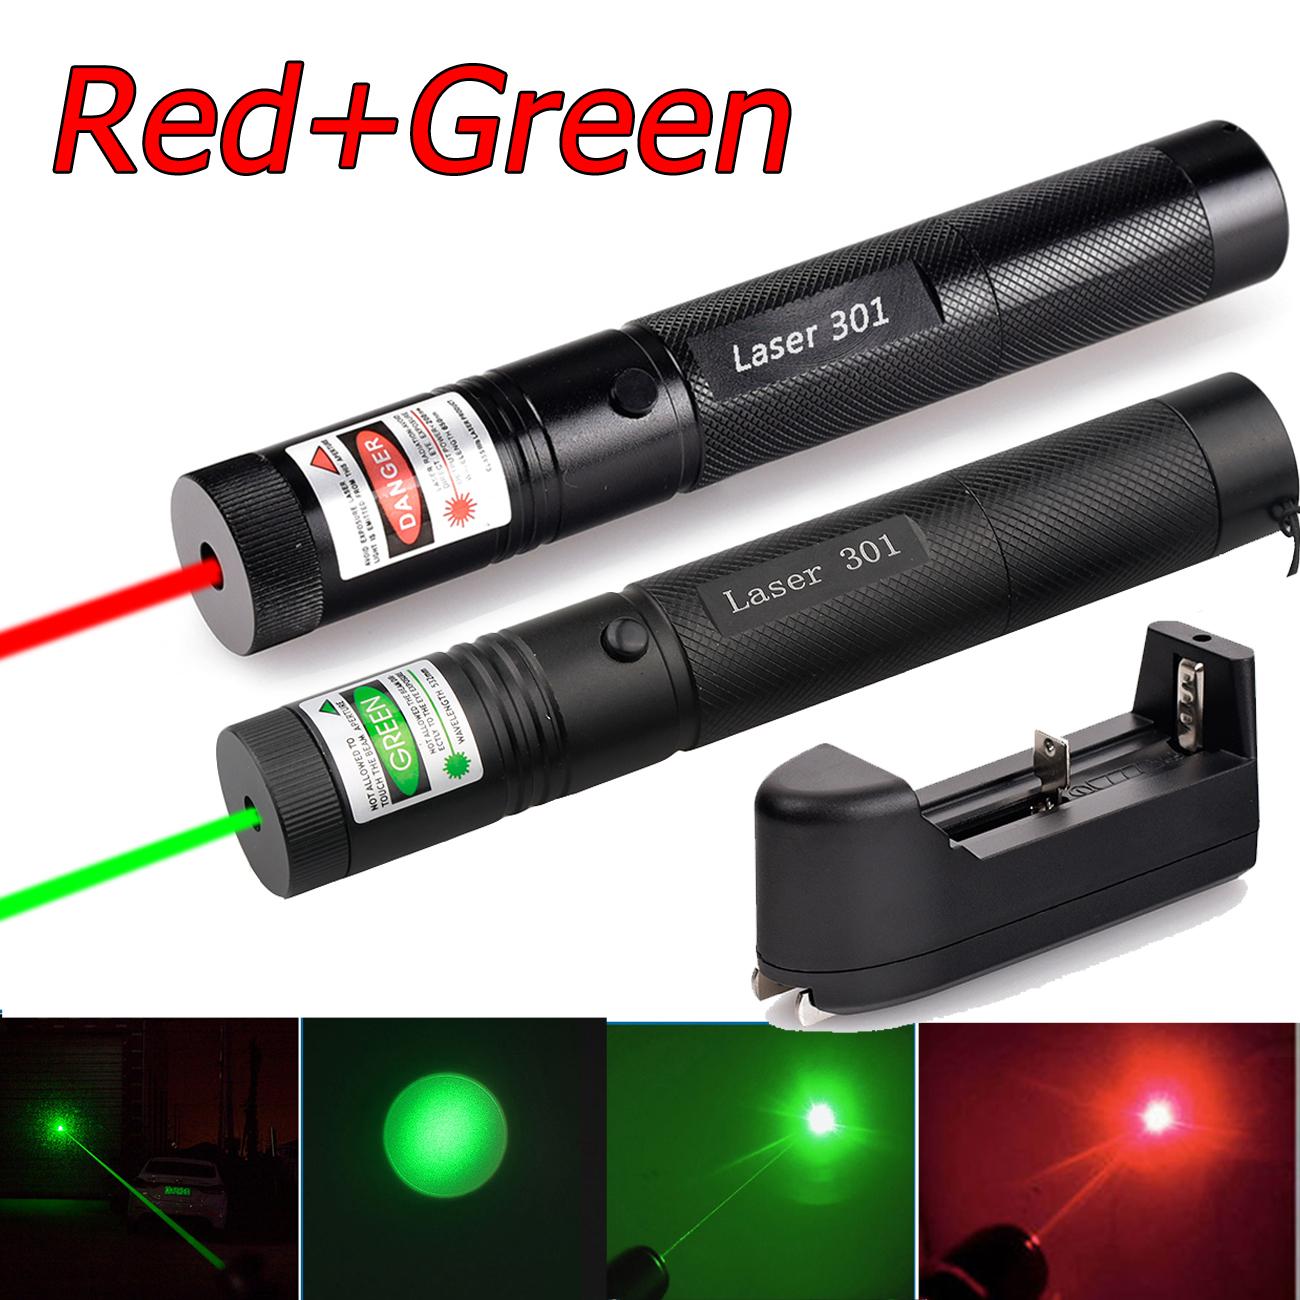 10Miles 532nm Green&650nm Red Beam Light Power Laser Pointer Pen+ Smart Charger